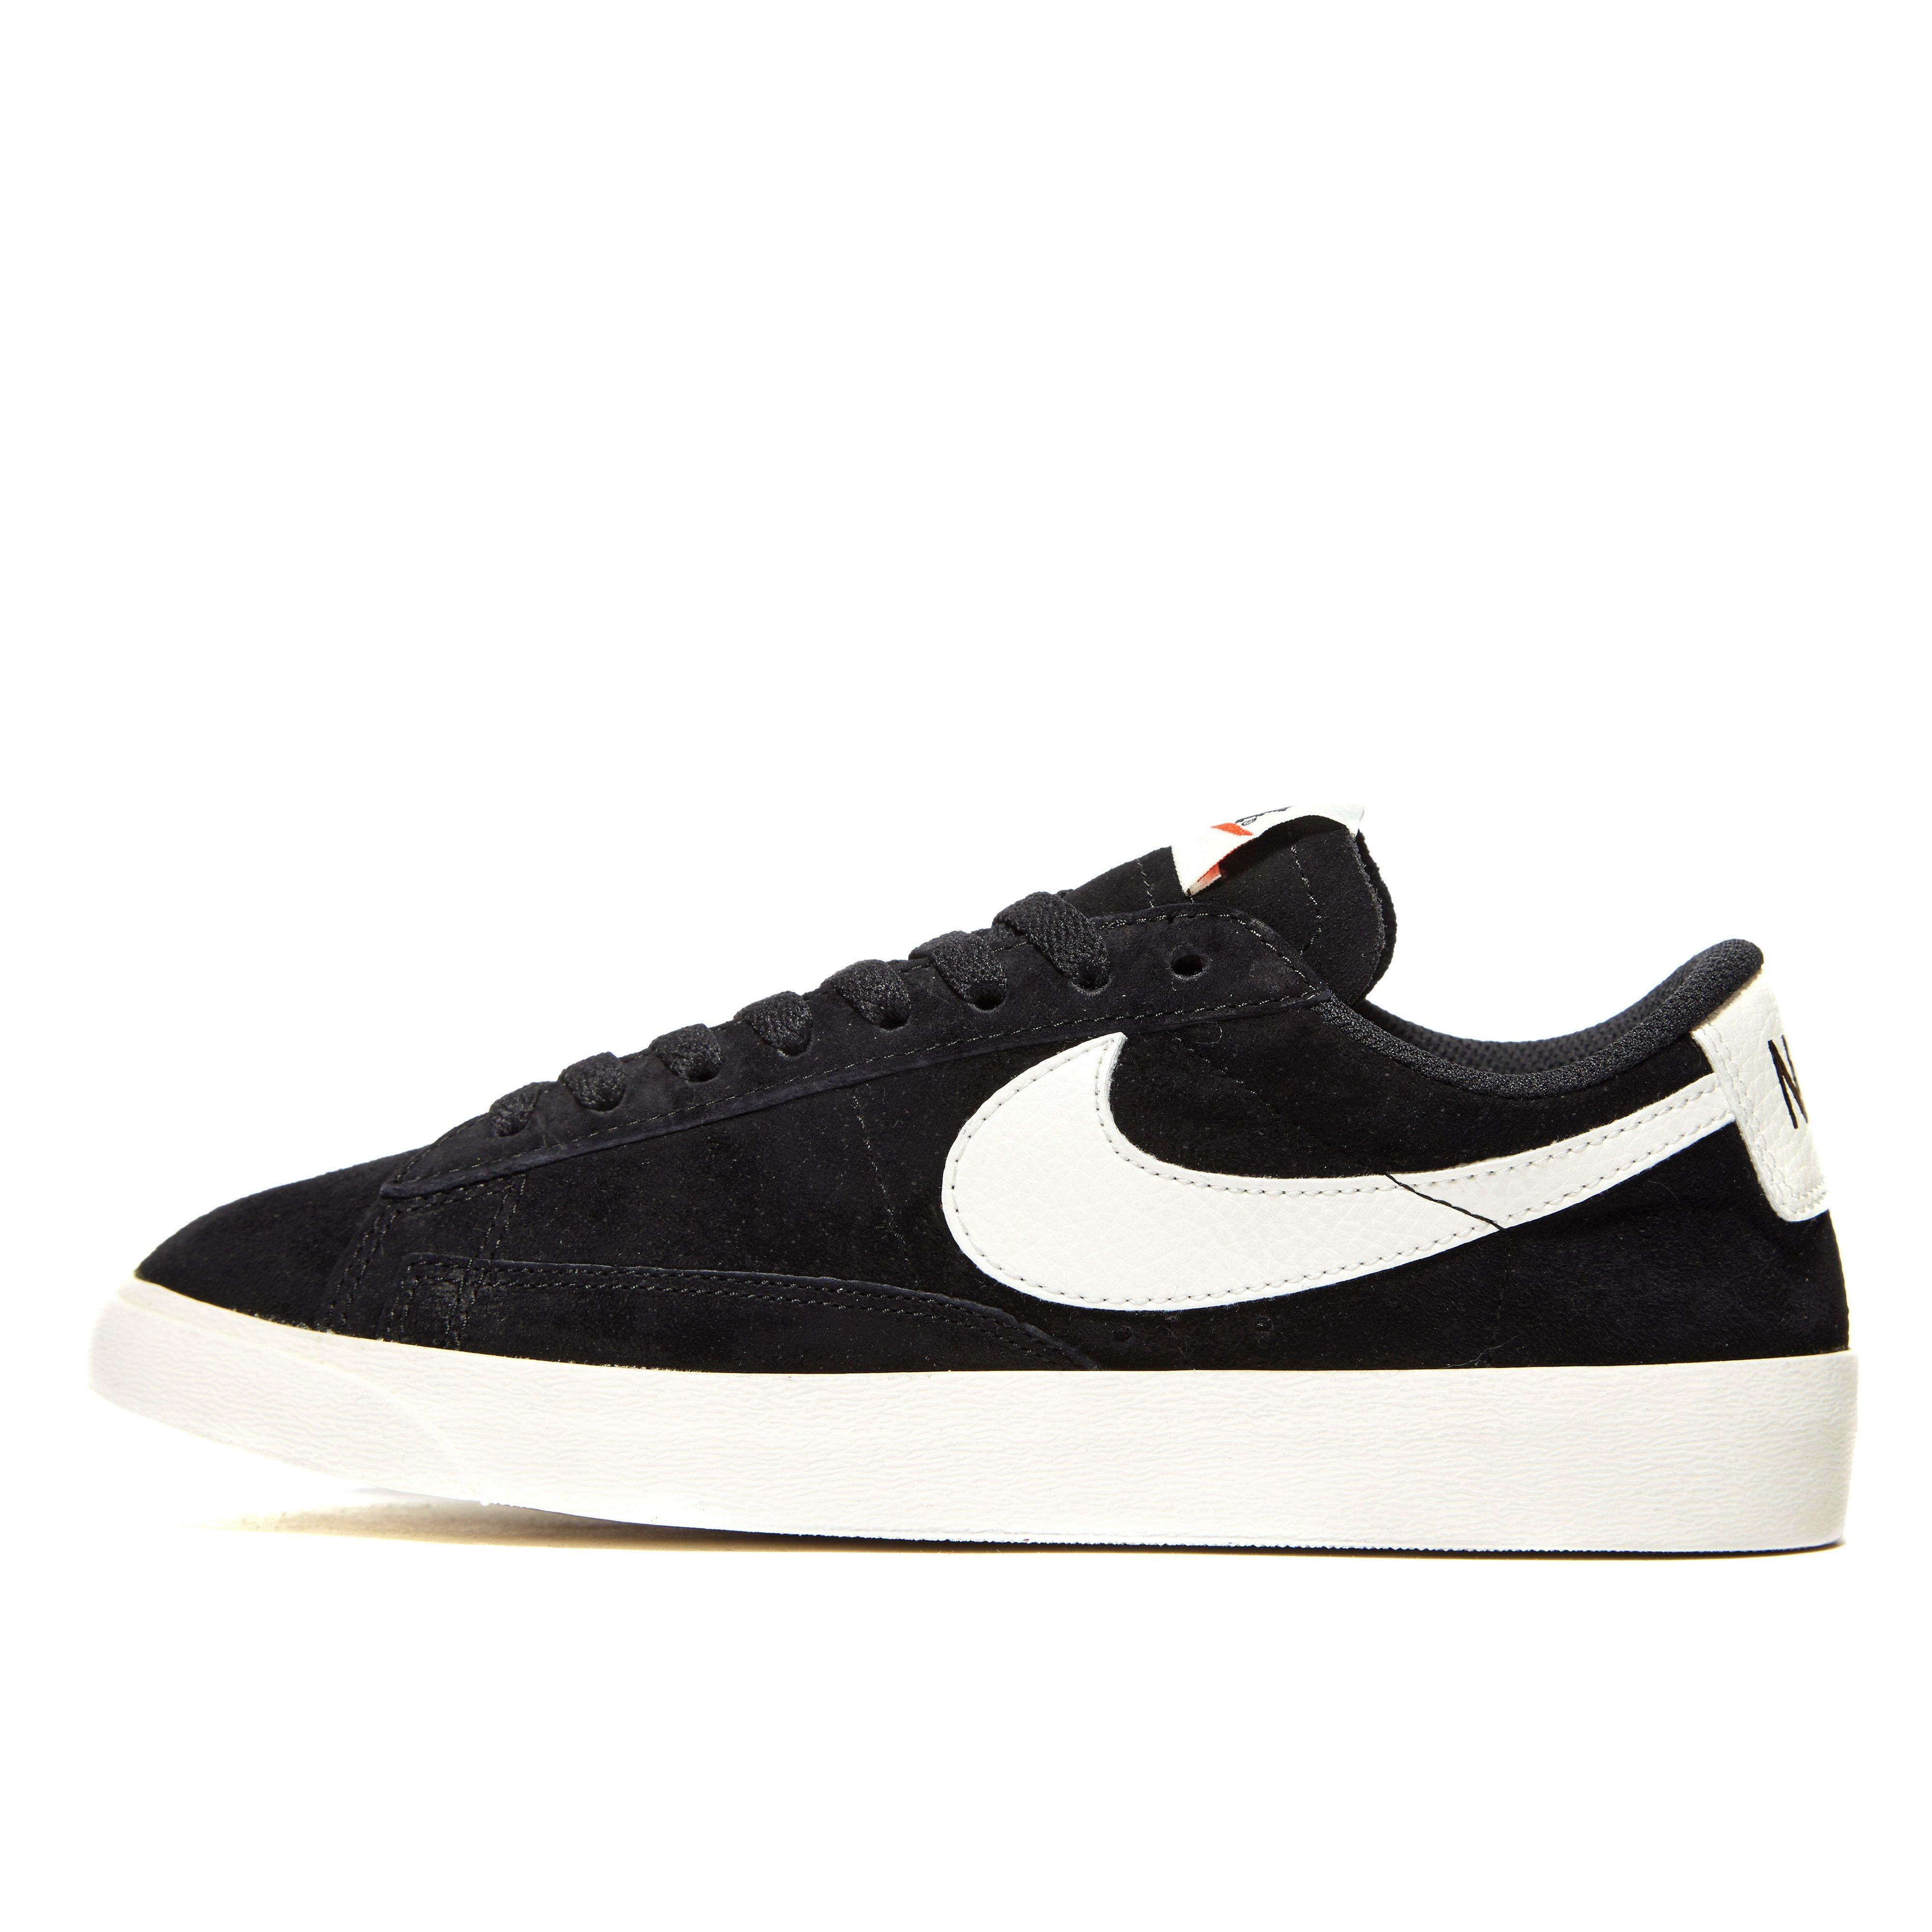 Nike Blazer Gris Colis Bas Formateurs Cru